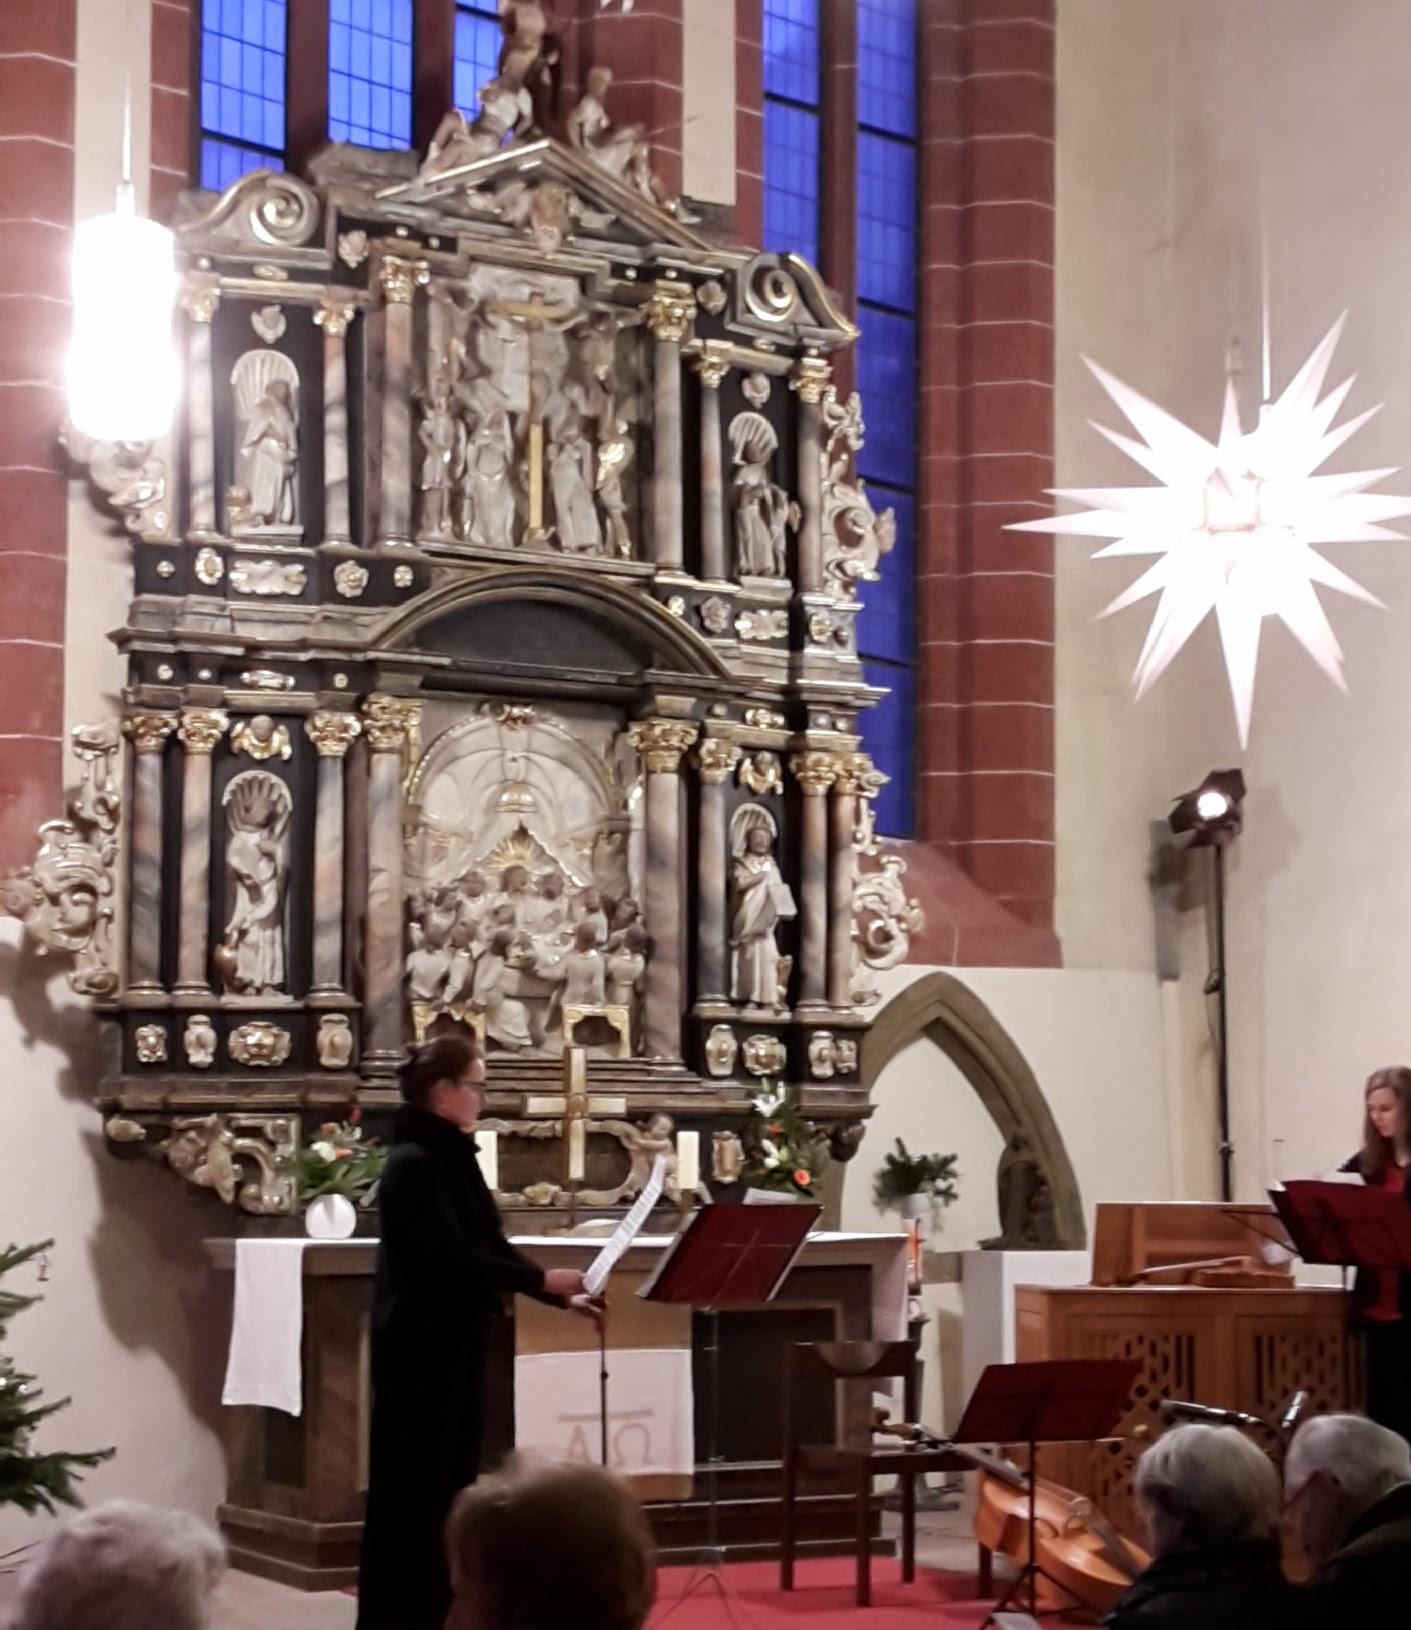 2017.12.31. musica florata erfurt 2 Michaeliskirche